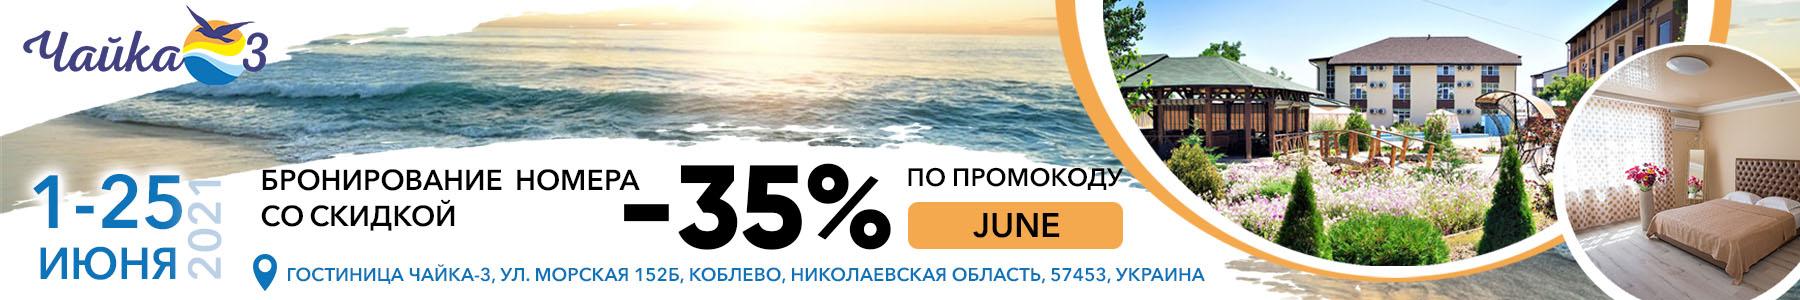 Промокод июнь